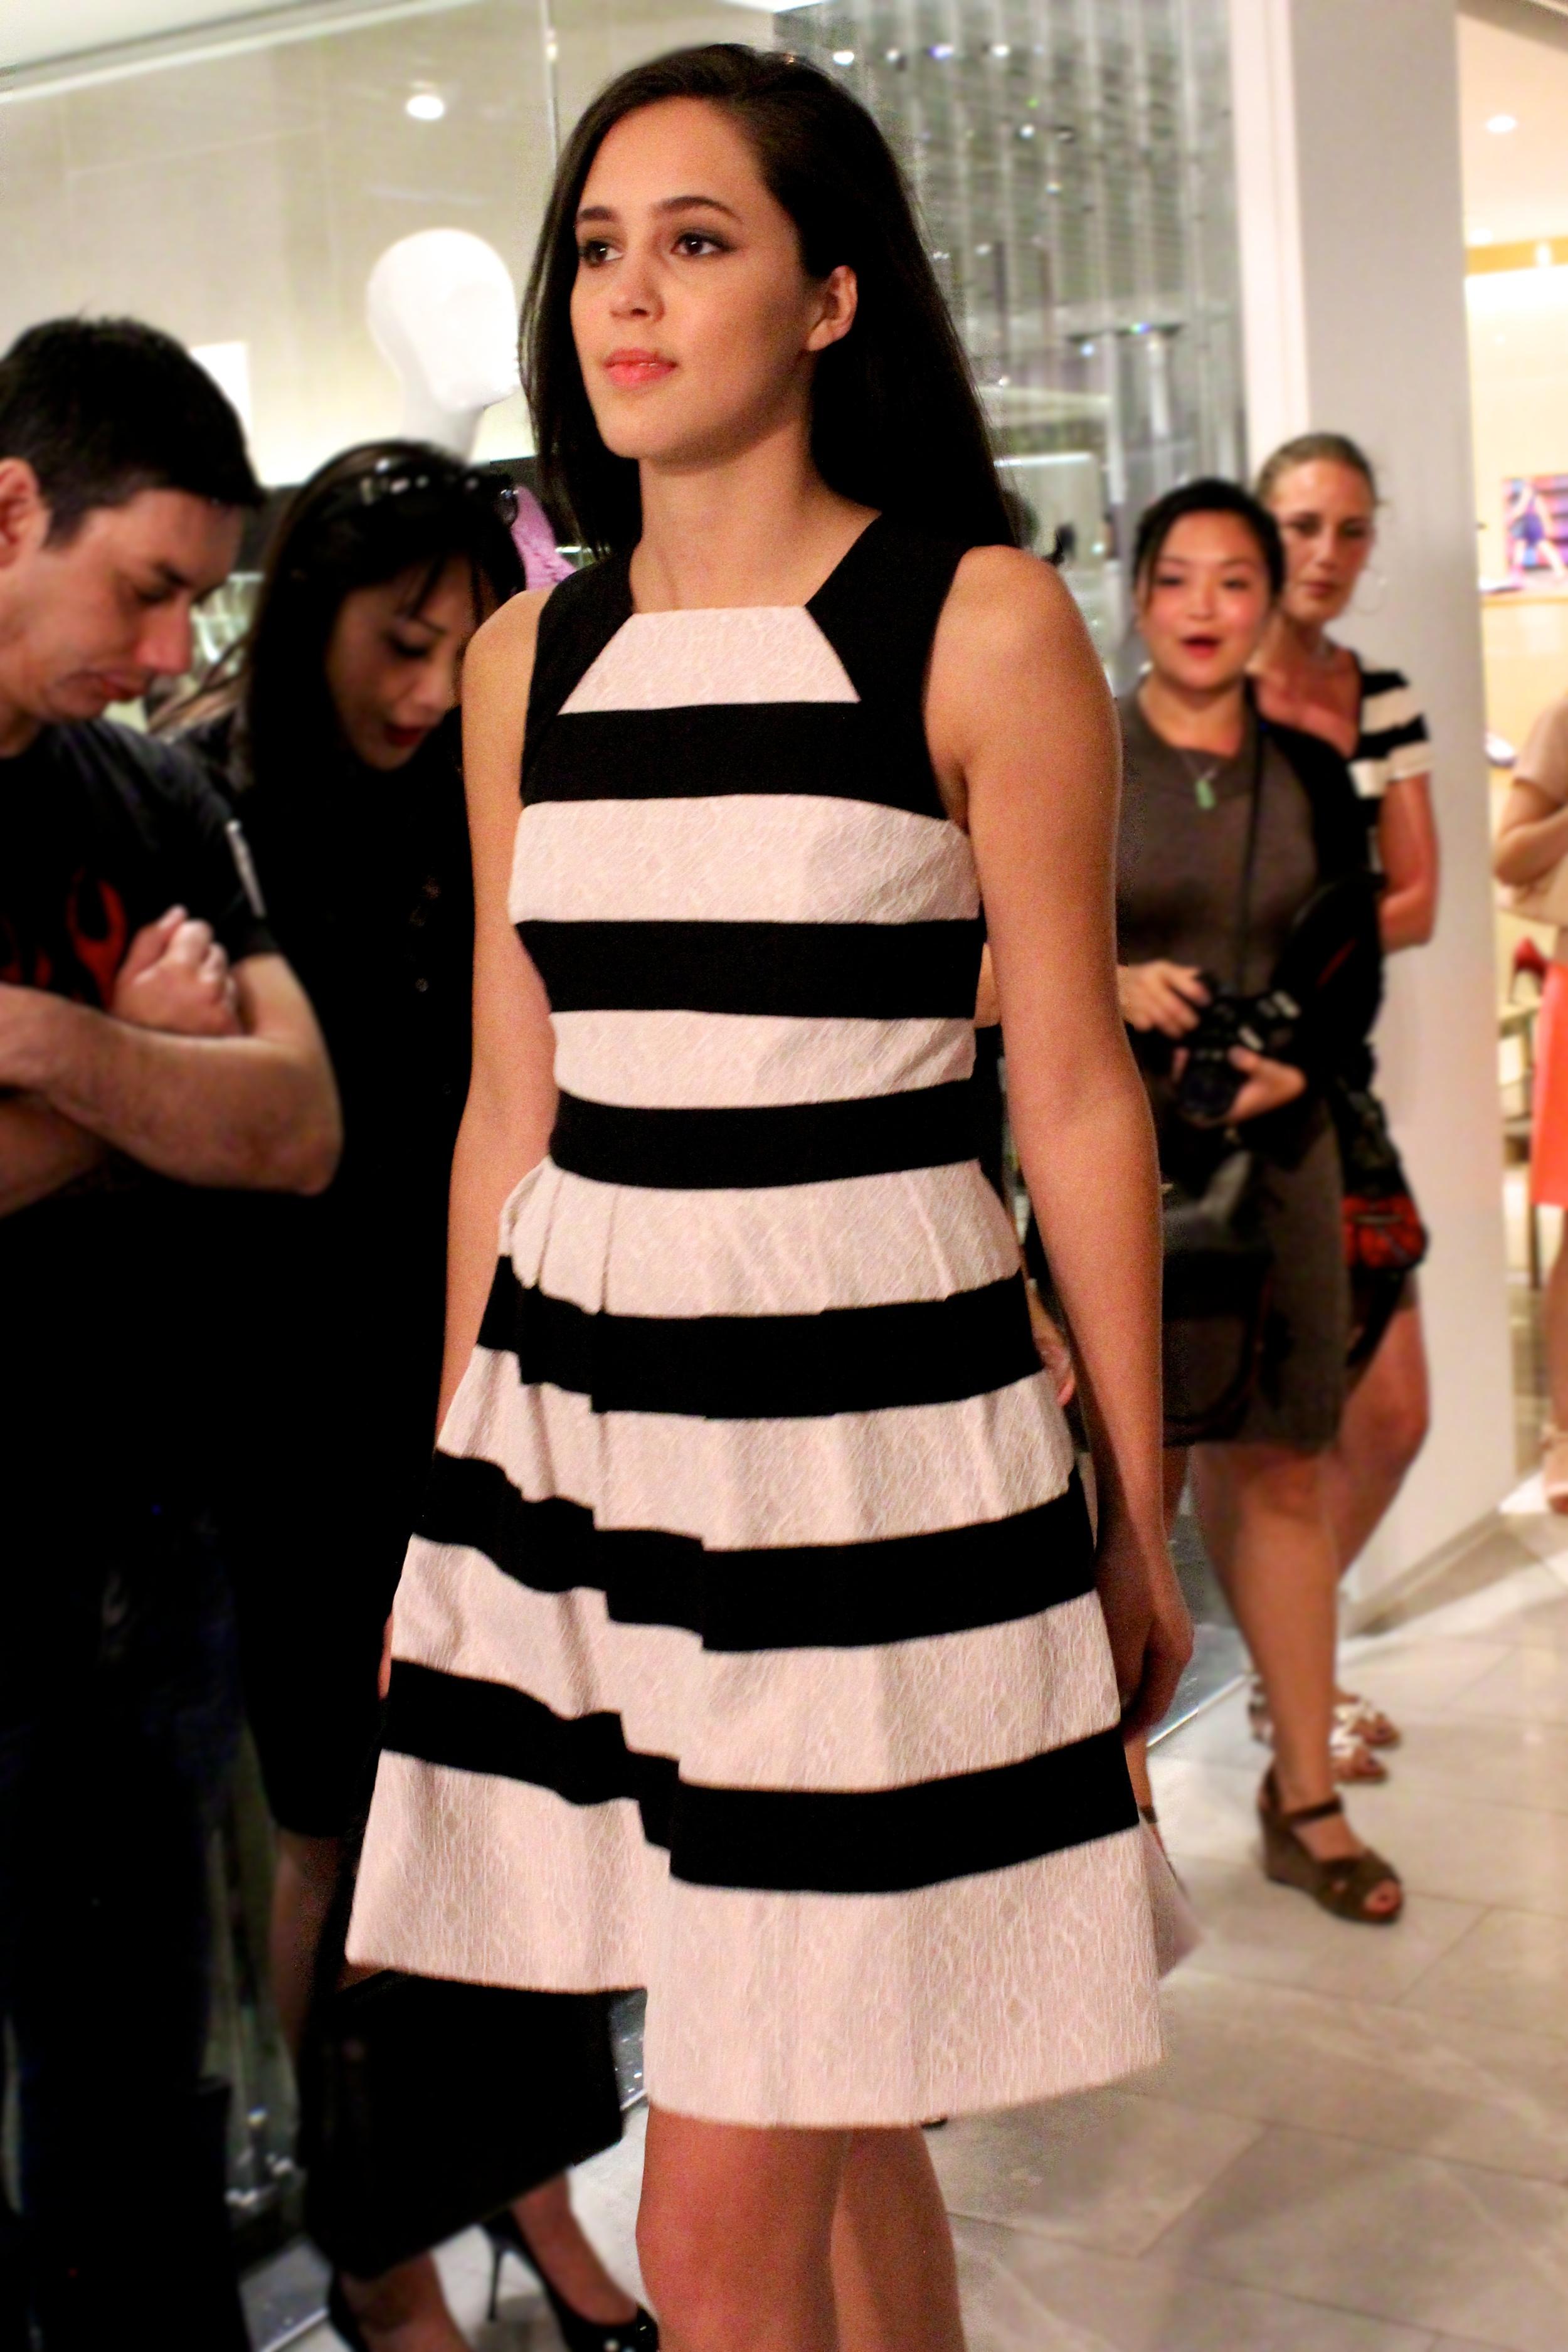 Dress: Lace stripe dress